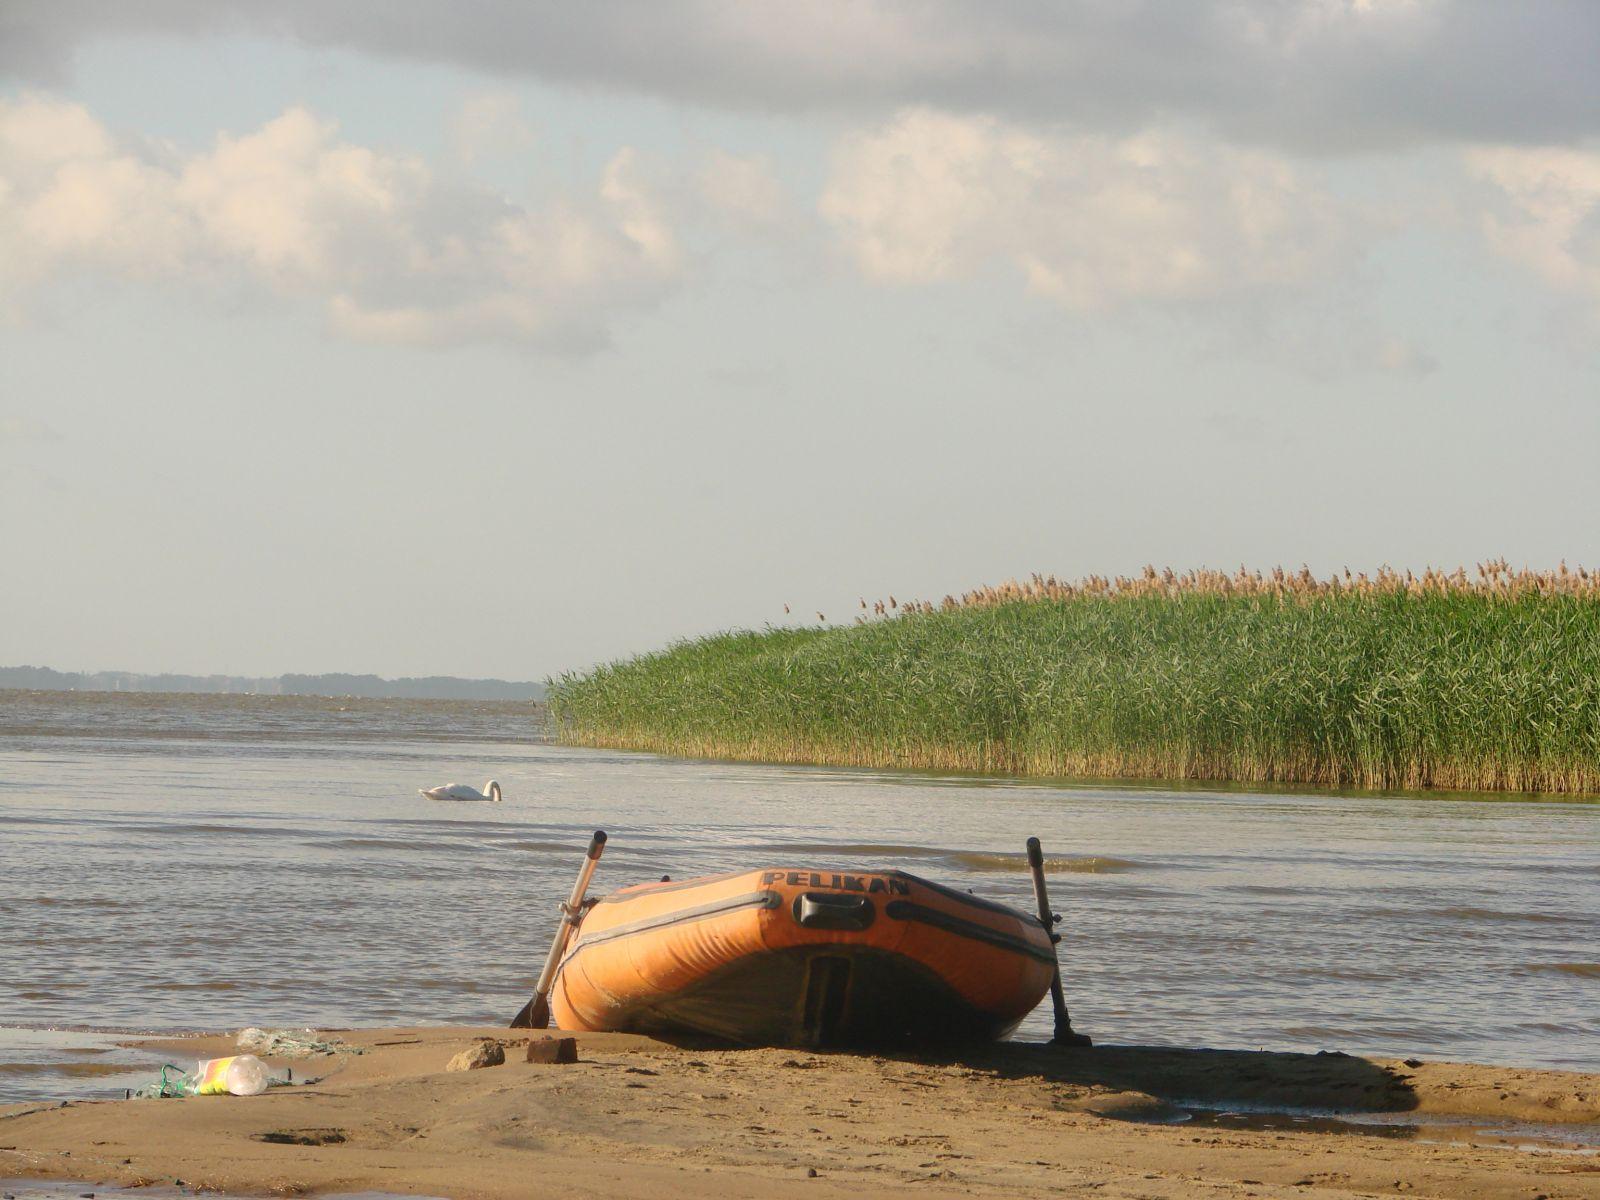 Рыжая лодка   лебедь